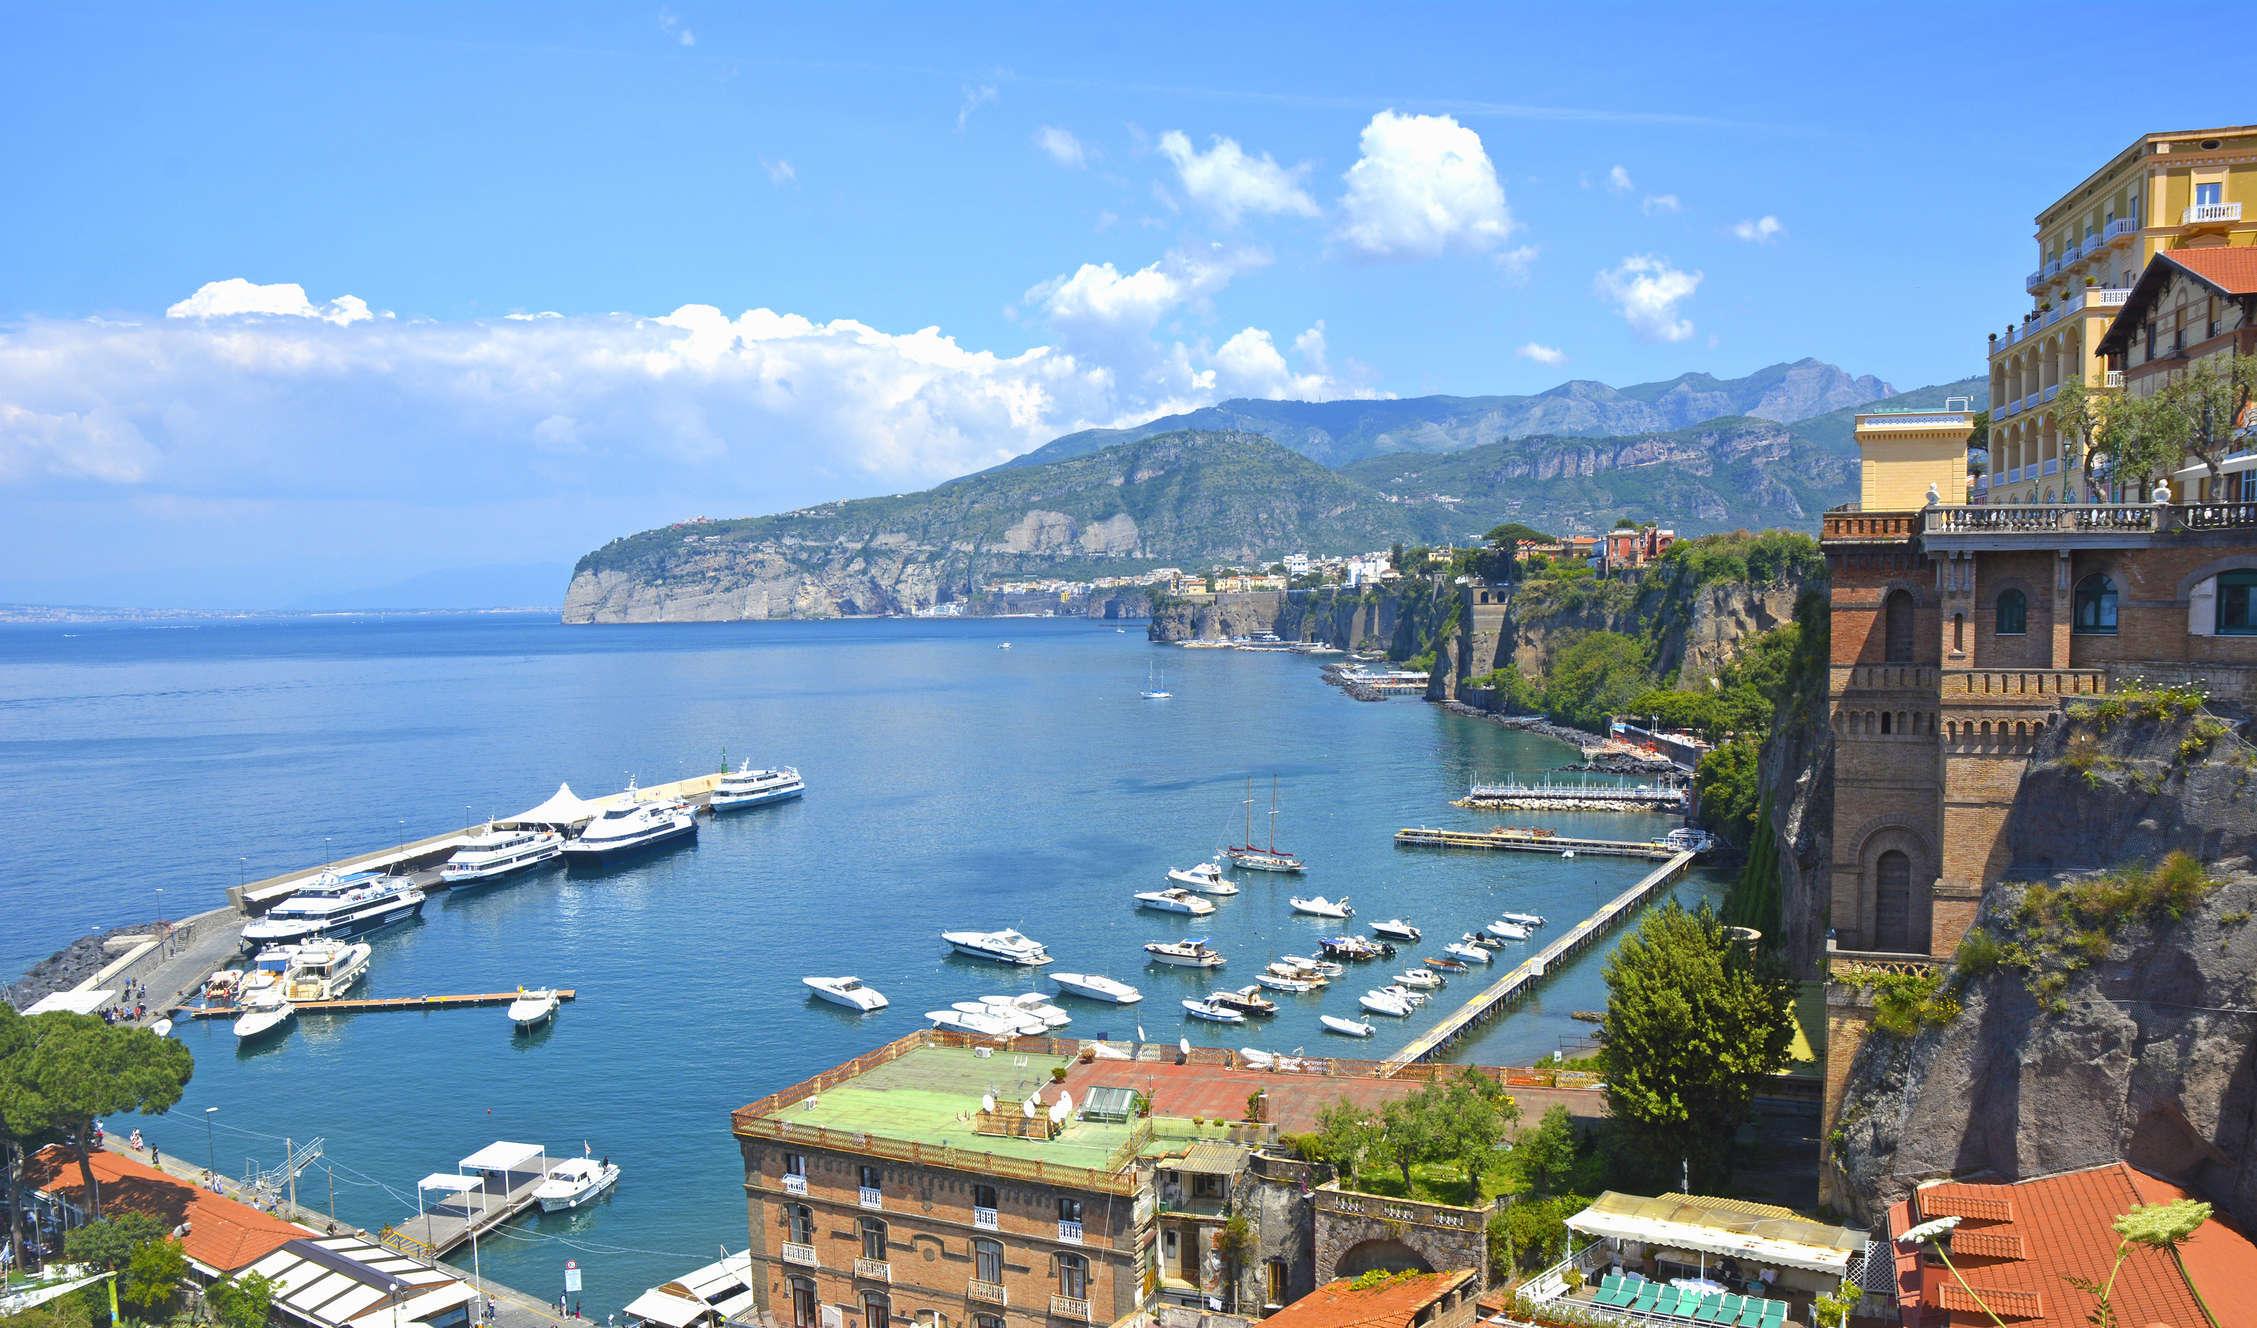 6° giorno: Costiera Amalfitana - Sorrento